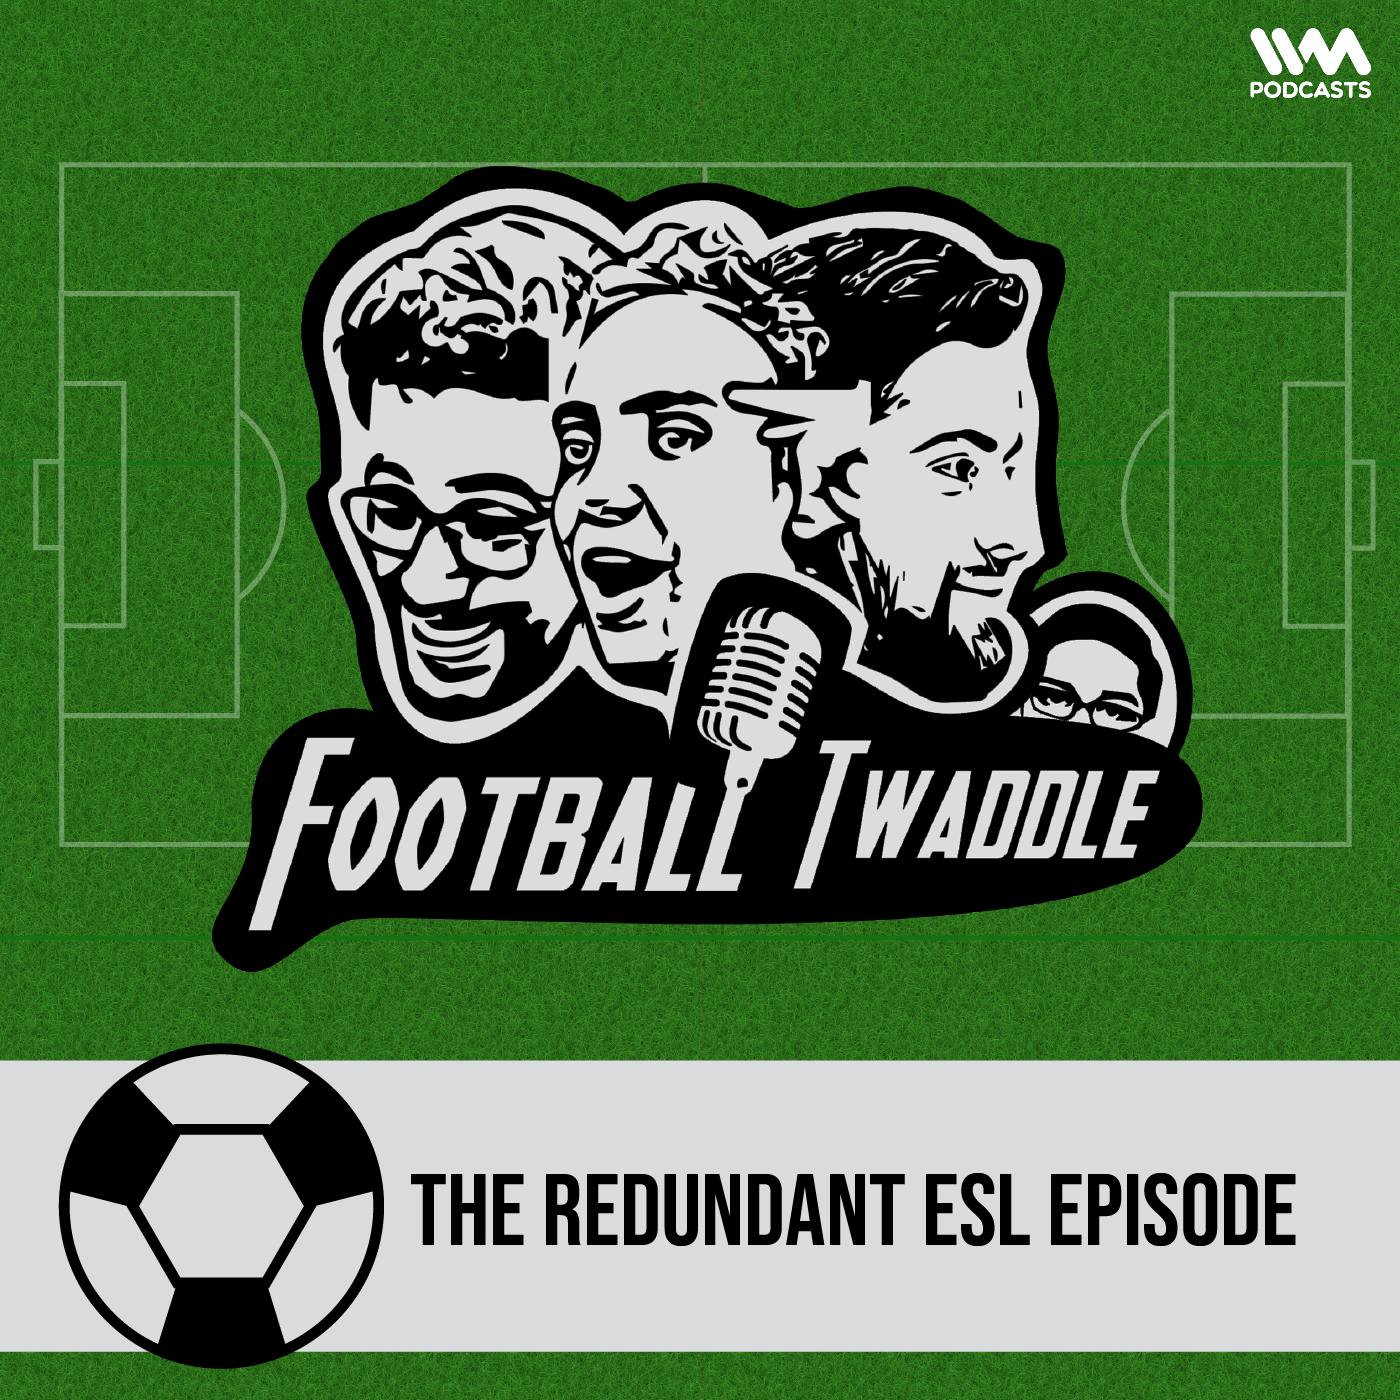 The redundant ESL episode